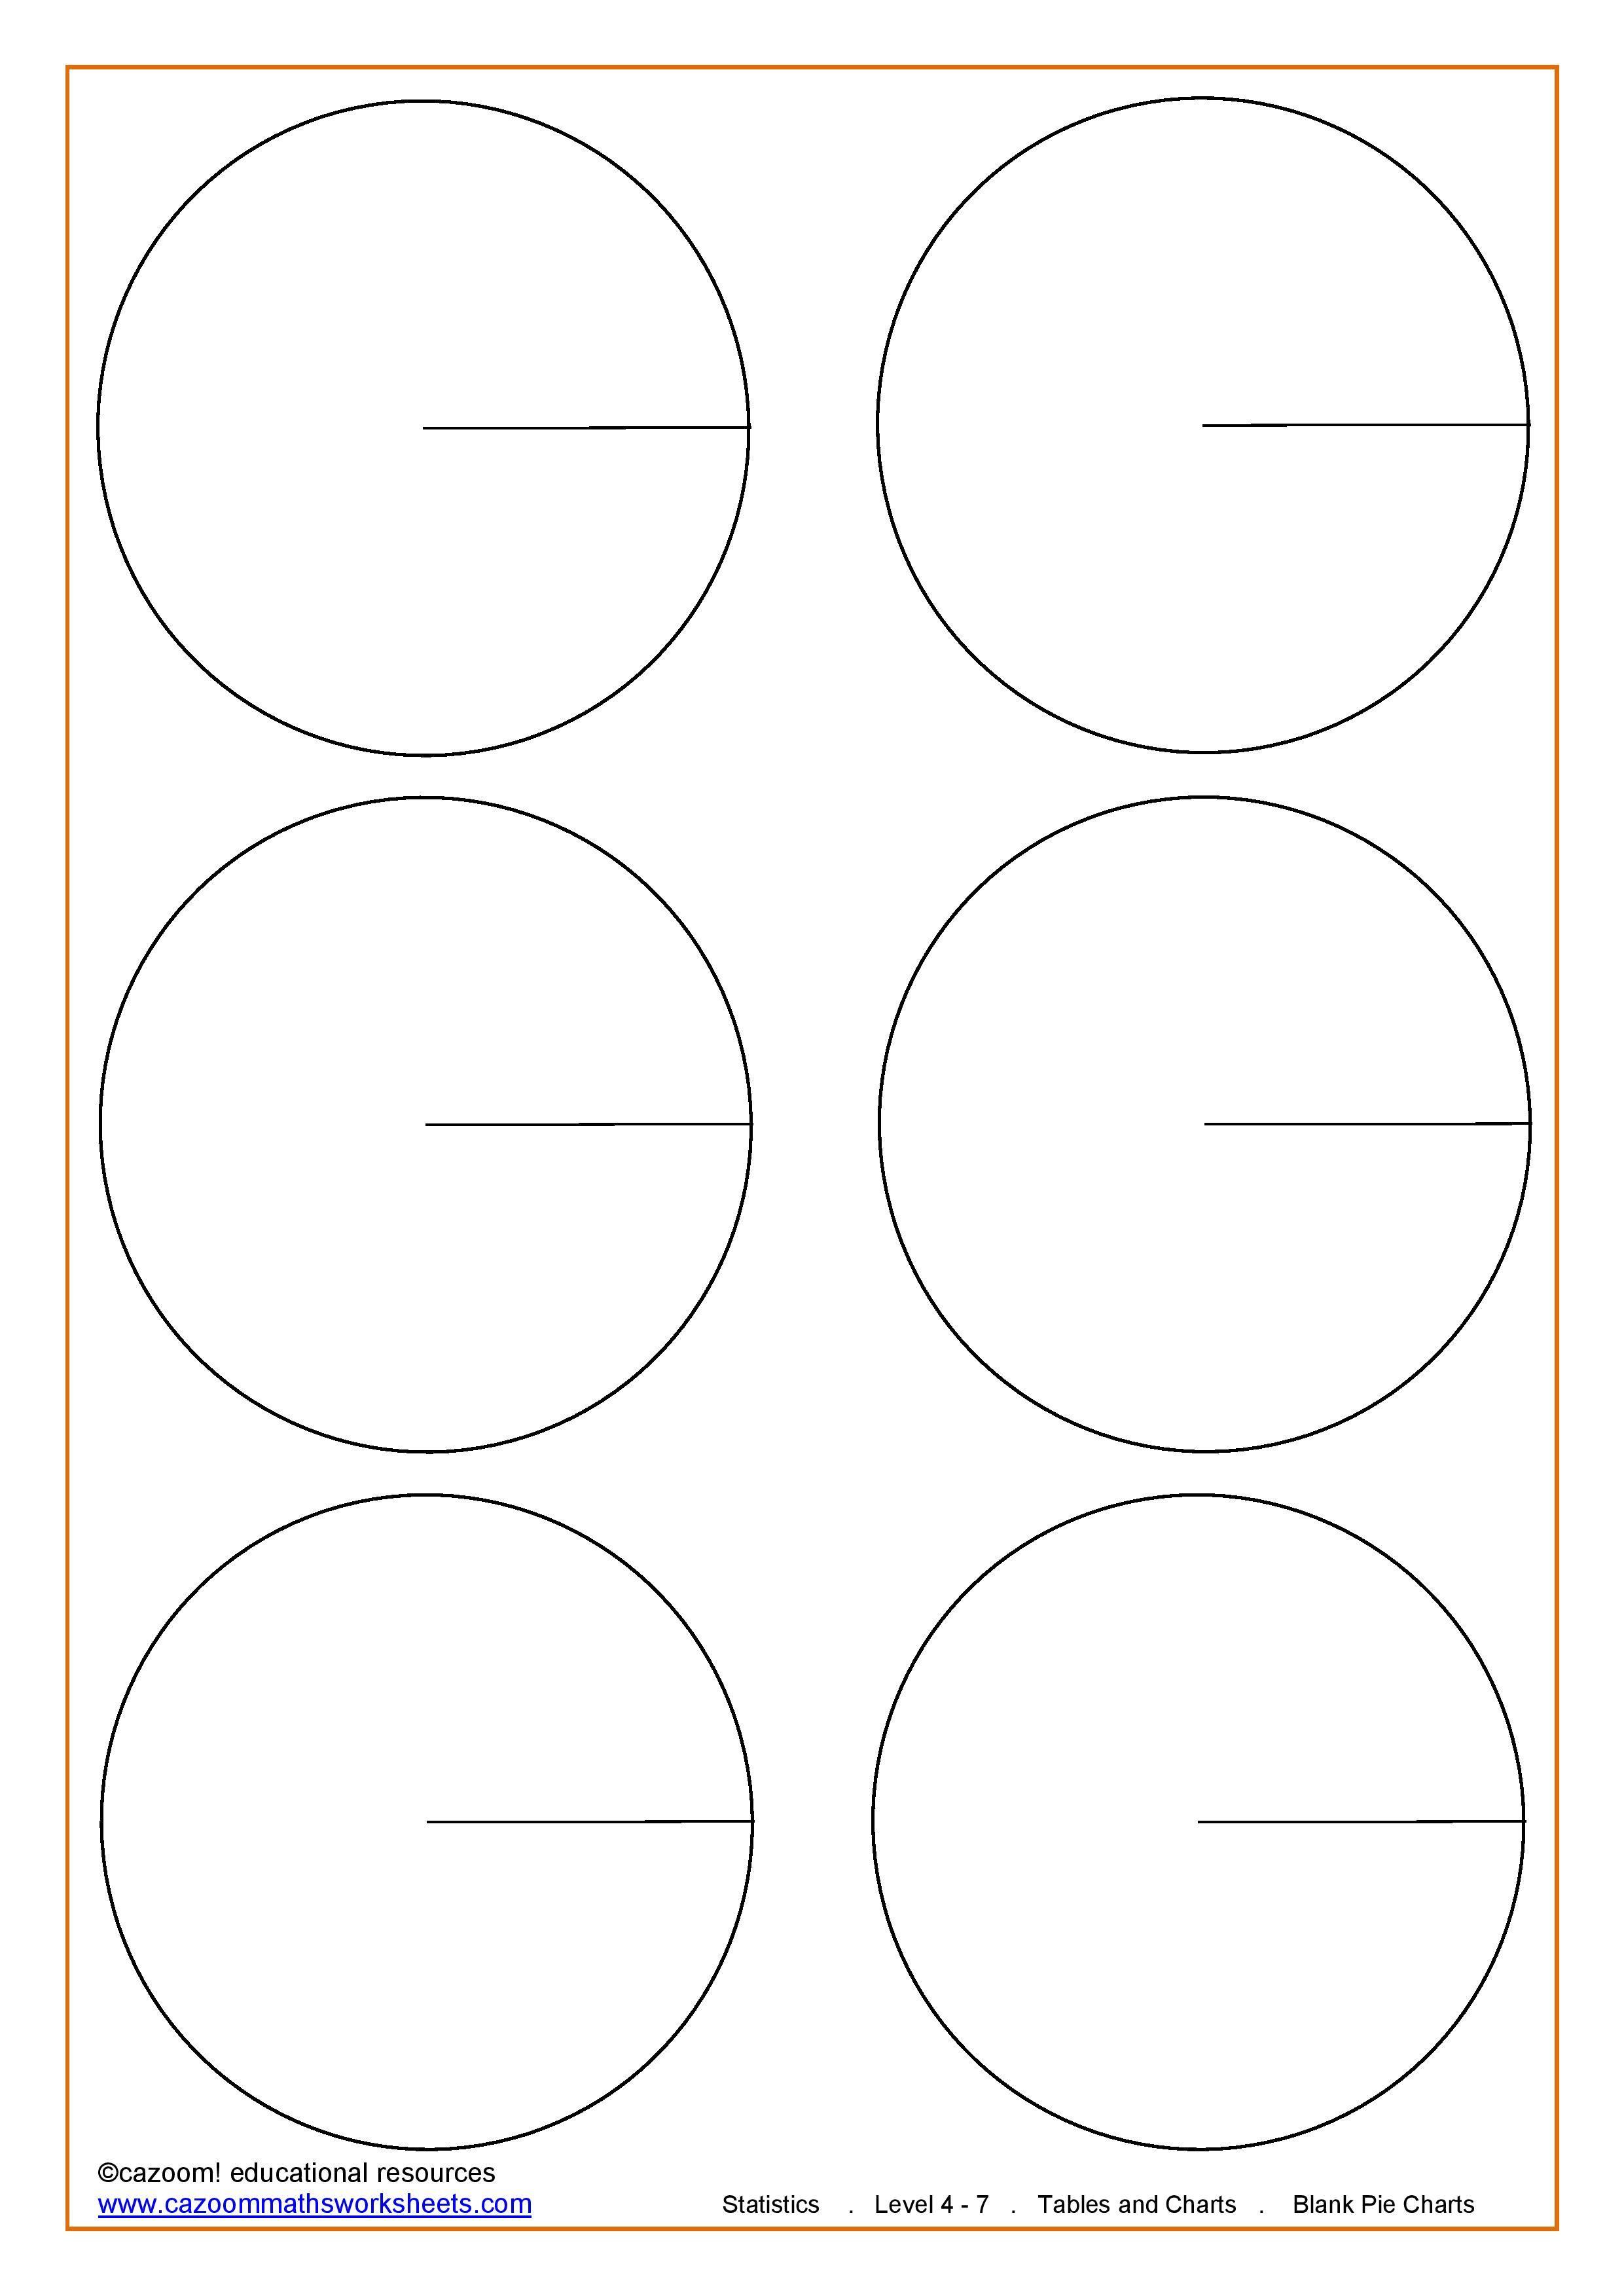 medium resolution of pie chart template worksheet - The future